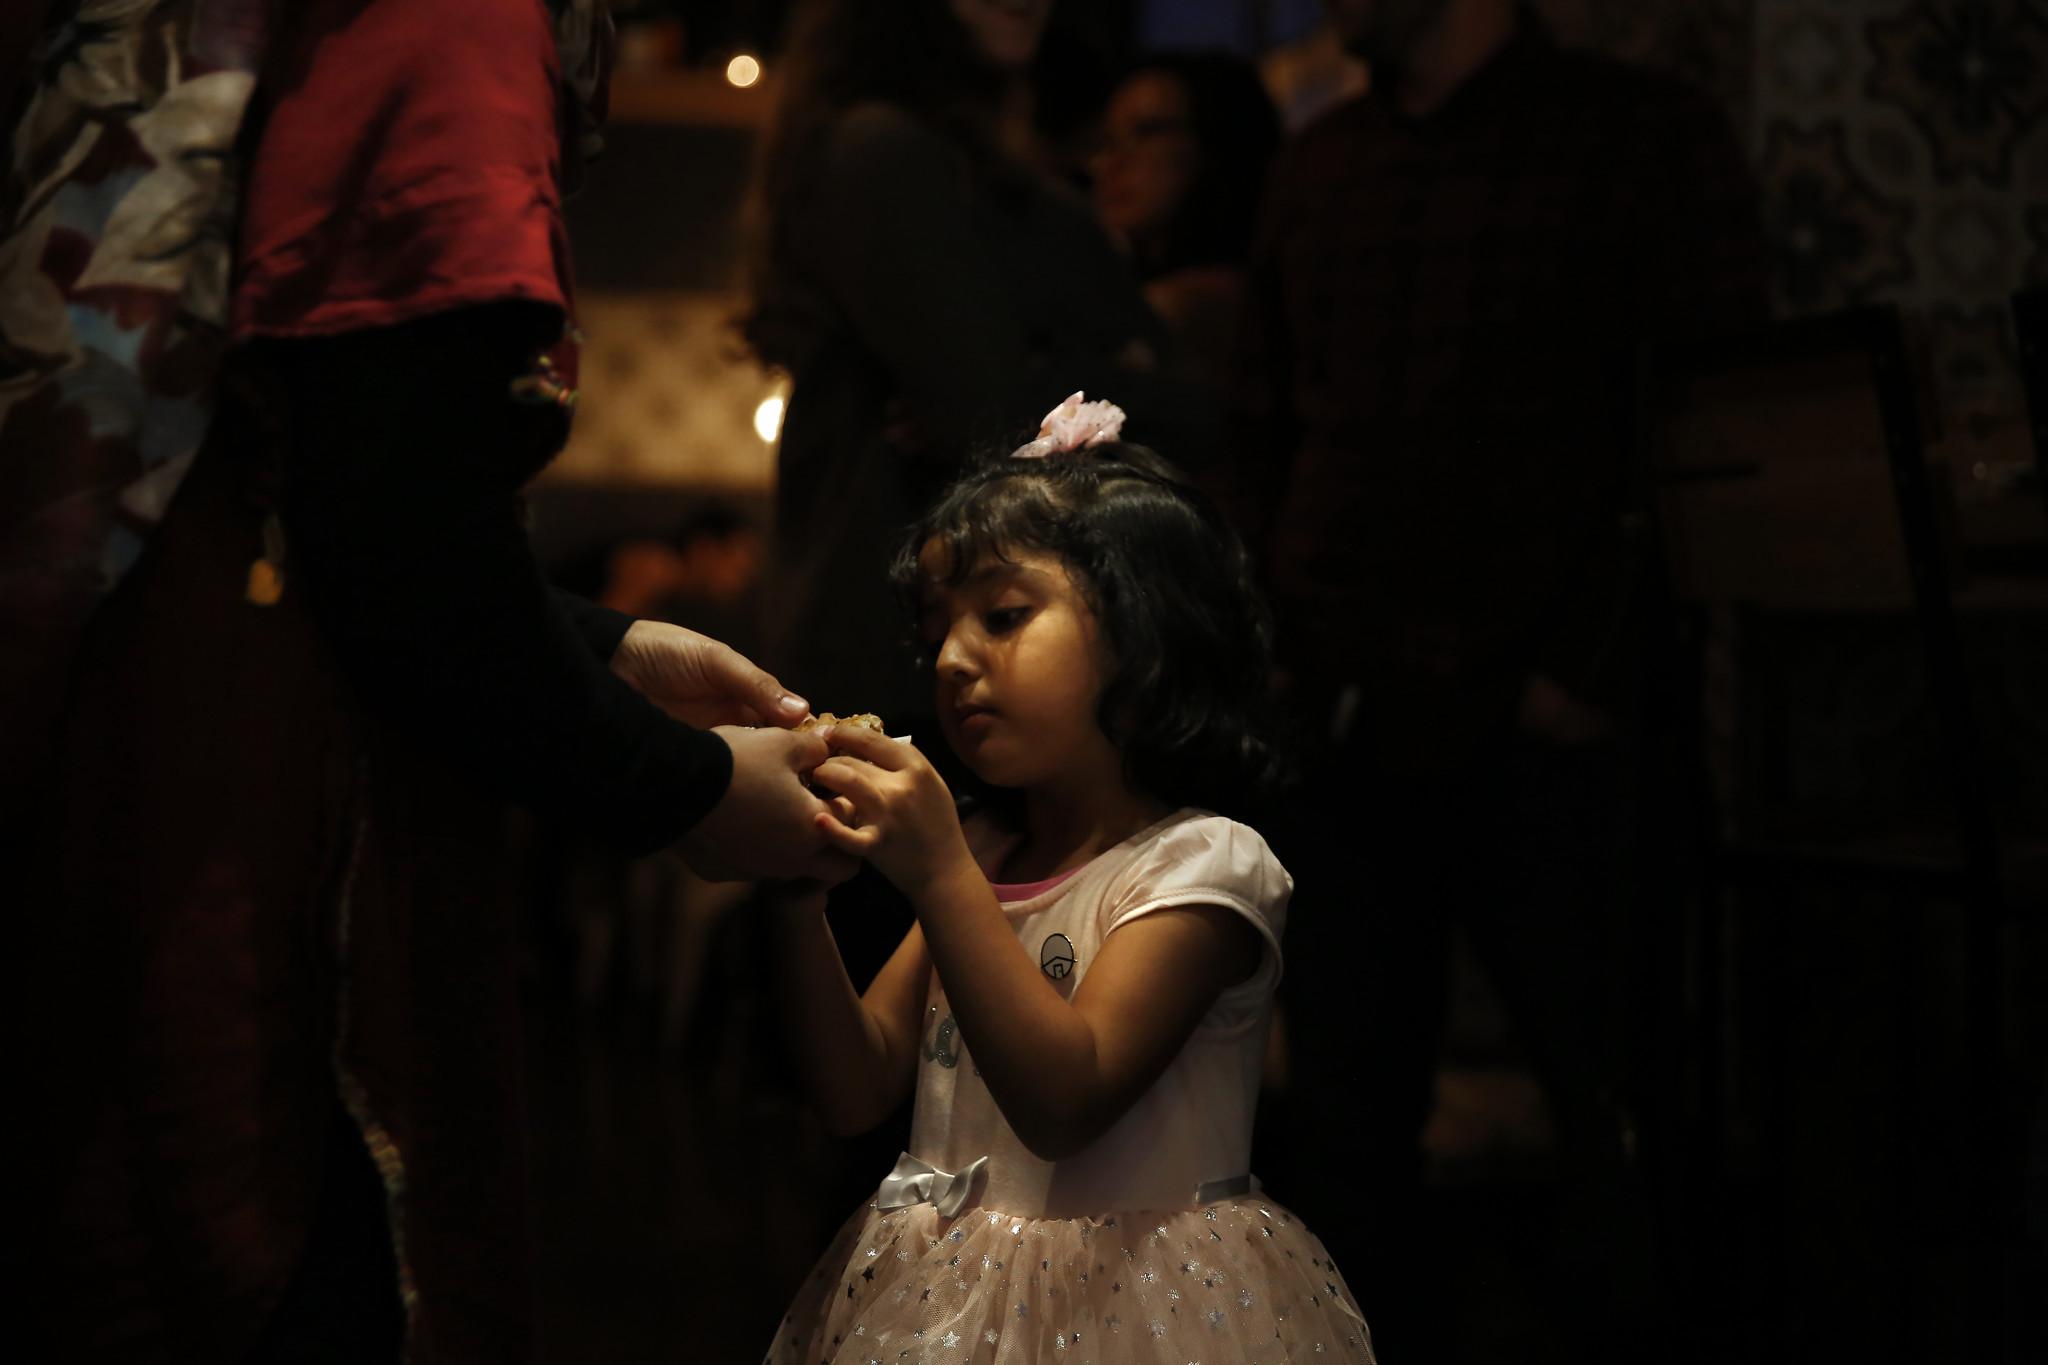 LOS ANGELES, CA-MARCH 31, 2019: Naseema Kashefi, left, feeds her daughter, Horifa Kashefi, 4, a piec